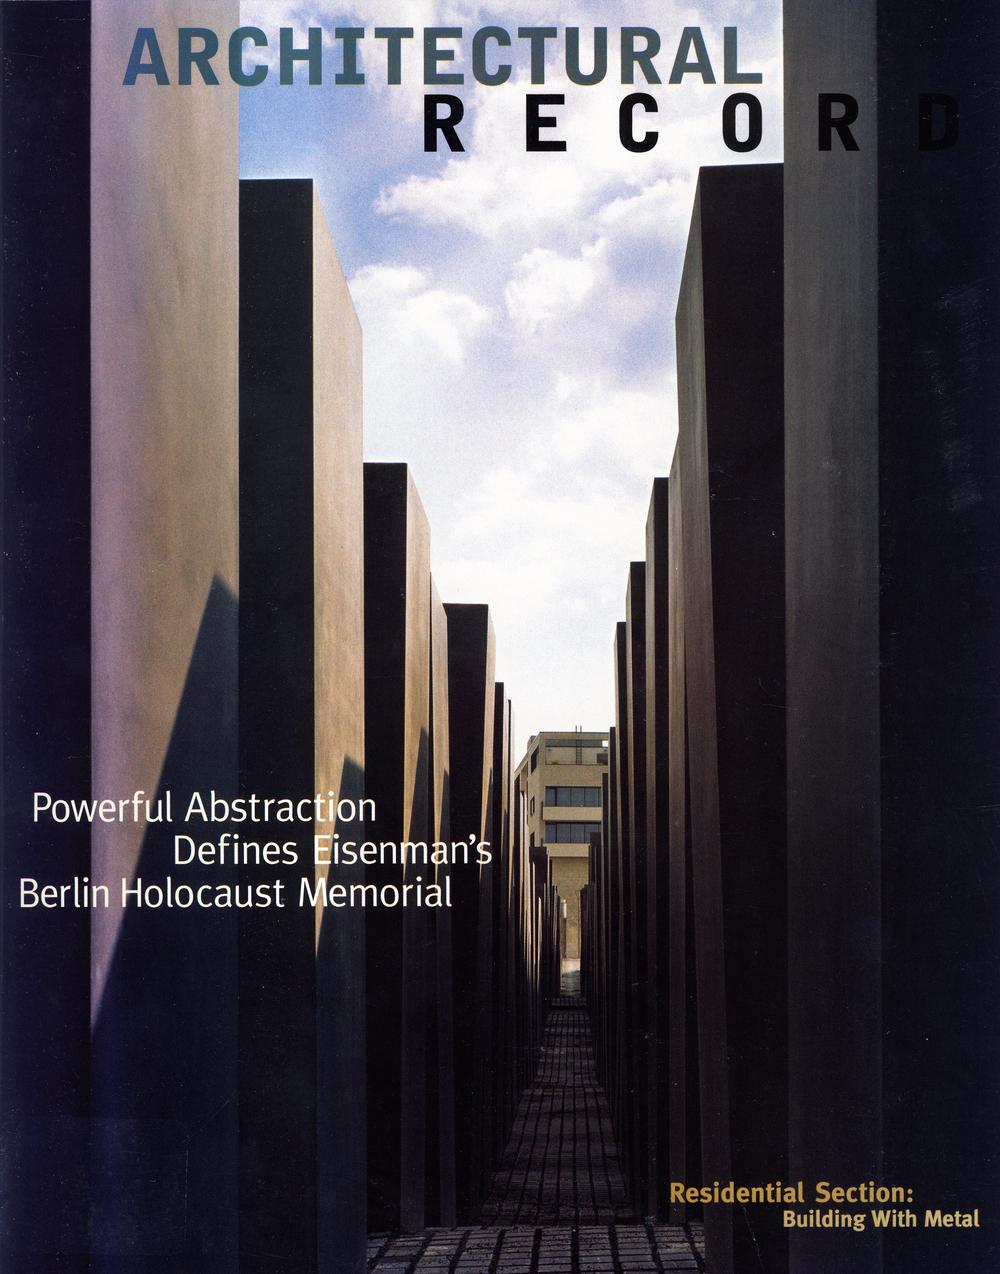 architectural record 2005_07.jpg